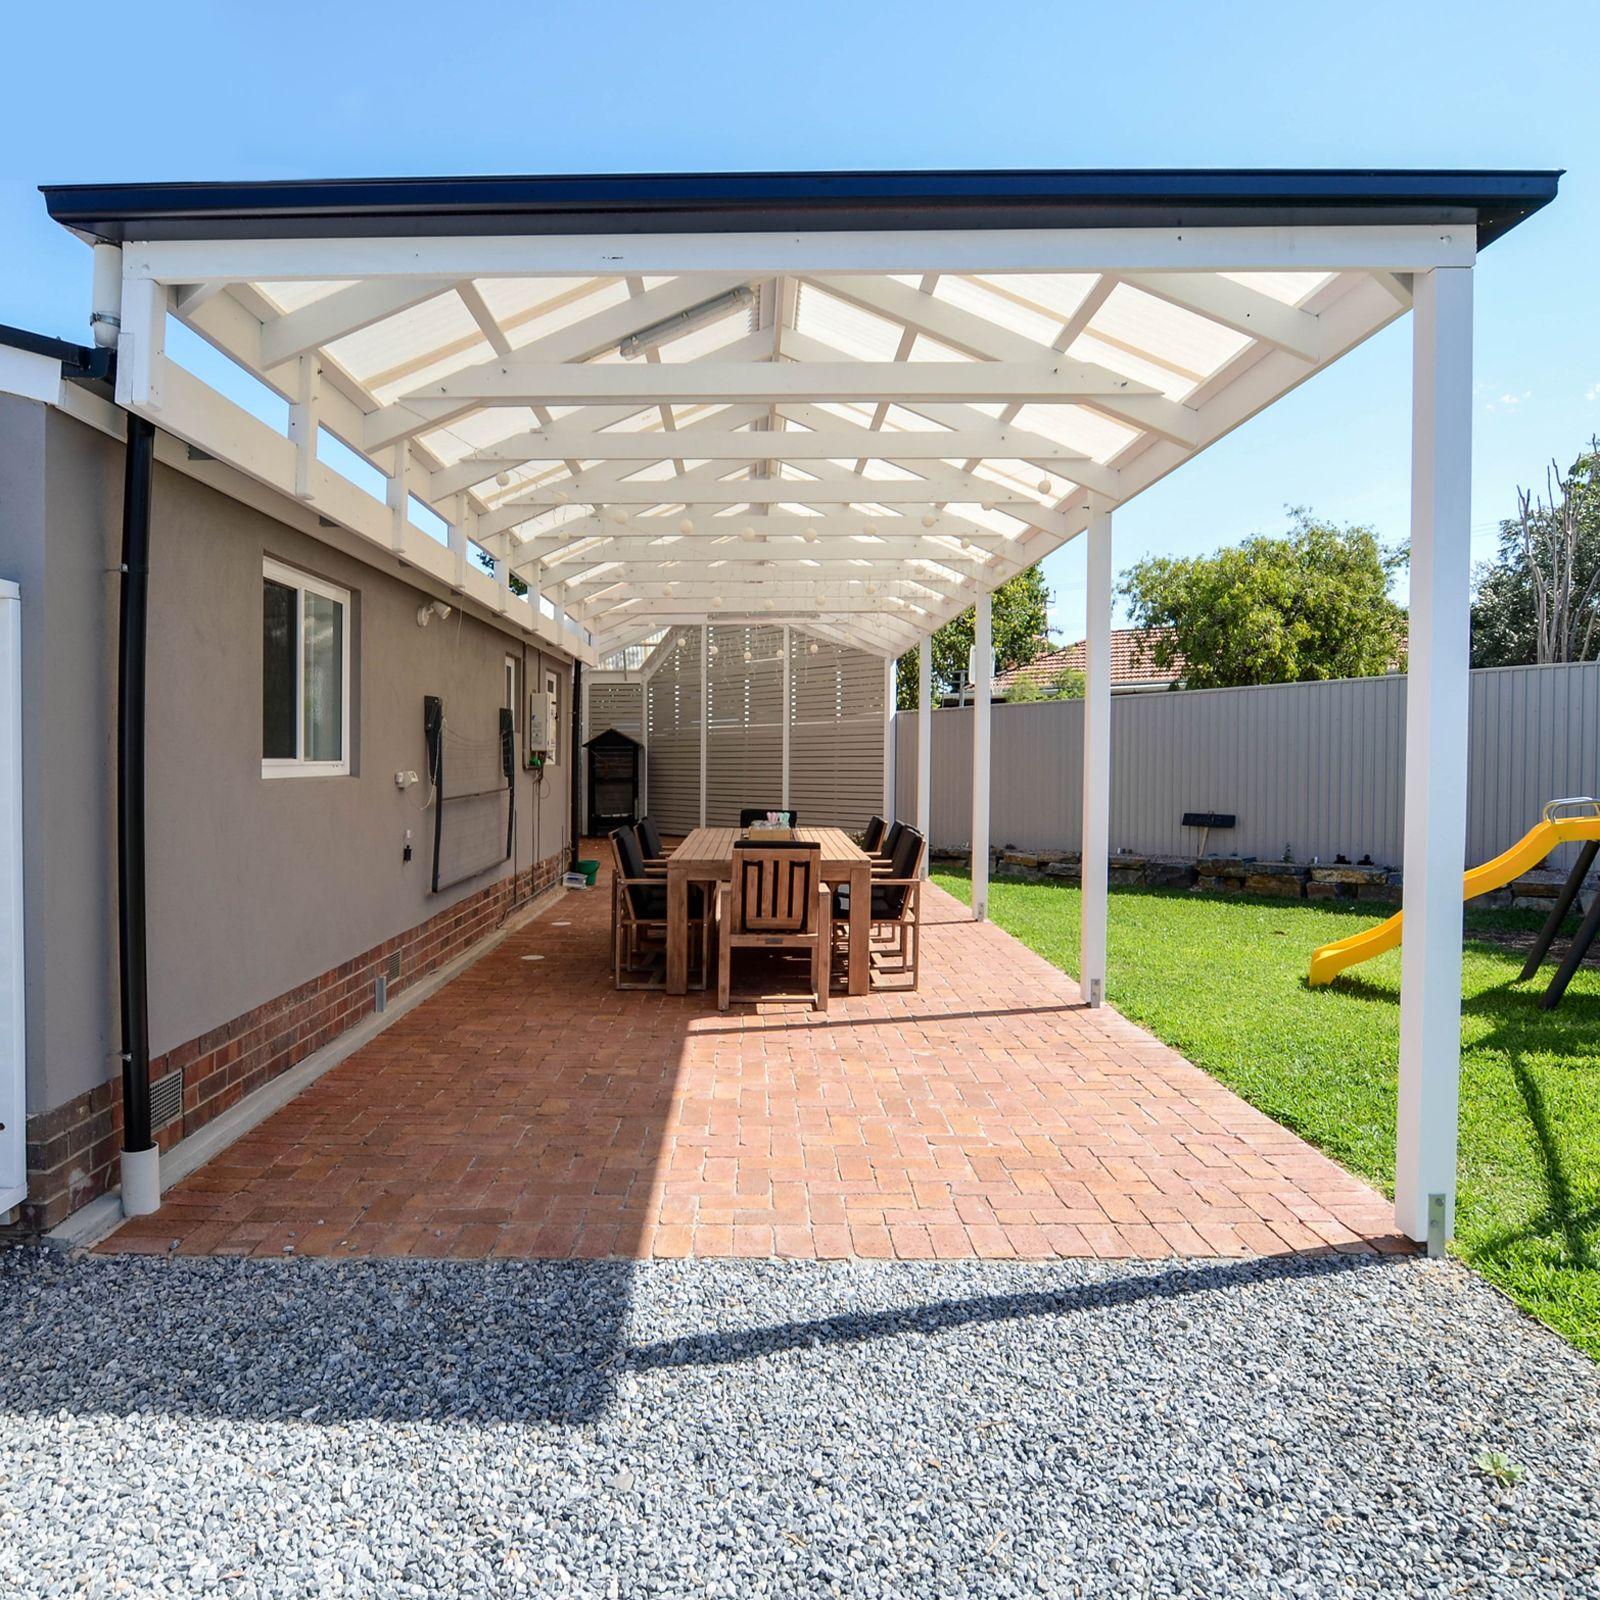 Pergola Designs Bunnings: Softwoods 10.8 X 3.8m Suntuf Solarsmart Gable Roof Pergola